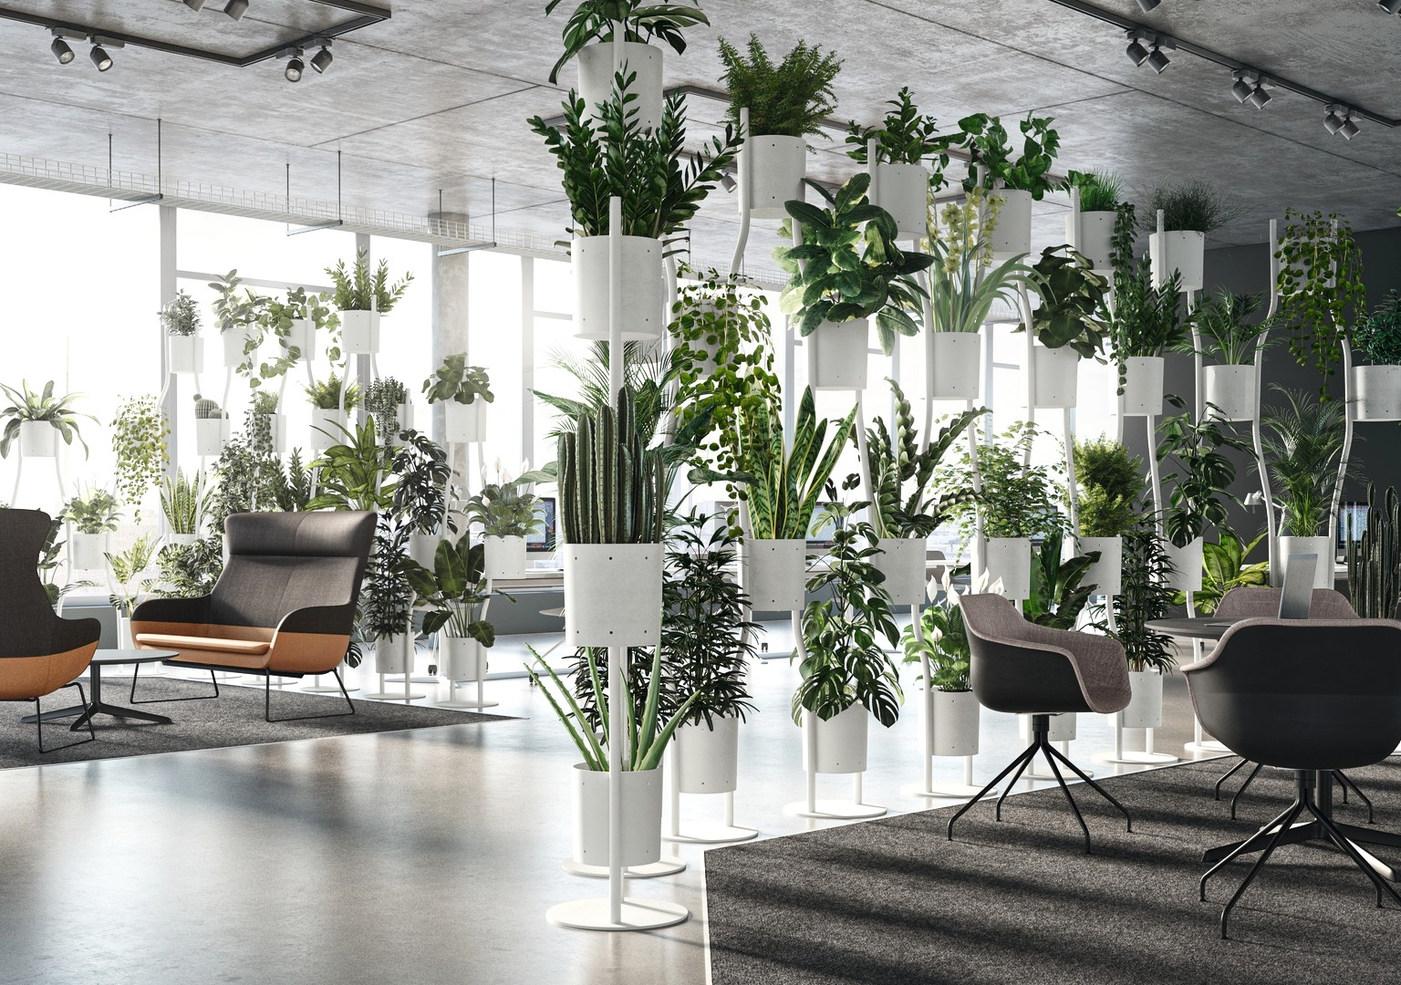 Modulares Raum-Begrünungssystem Freistehender, moderner Pflanzenraumteiler